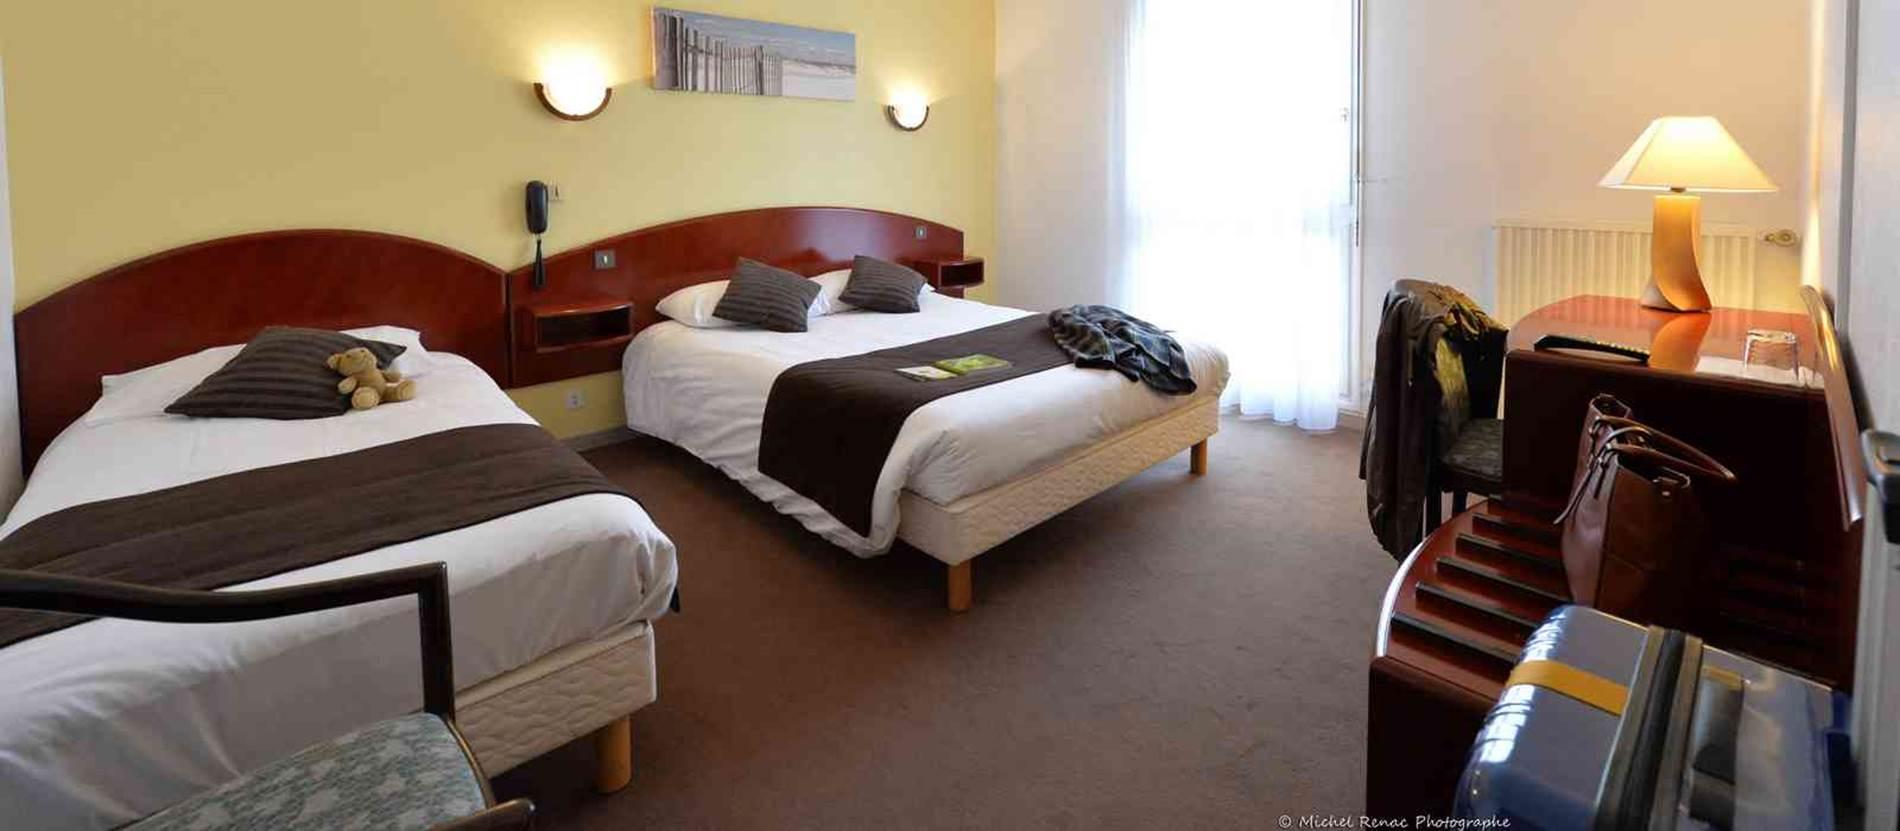 hotel-logis-letylann-saintave-morbihan-bretagne-sud © hotel-logis-letylann-saintave-morbihan-bretagne-sud